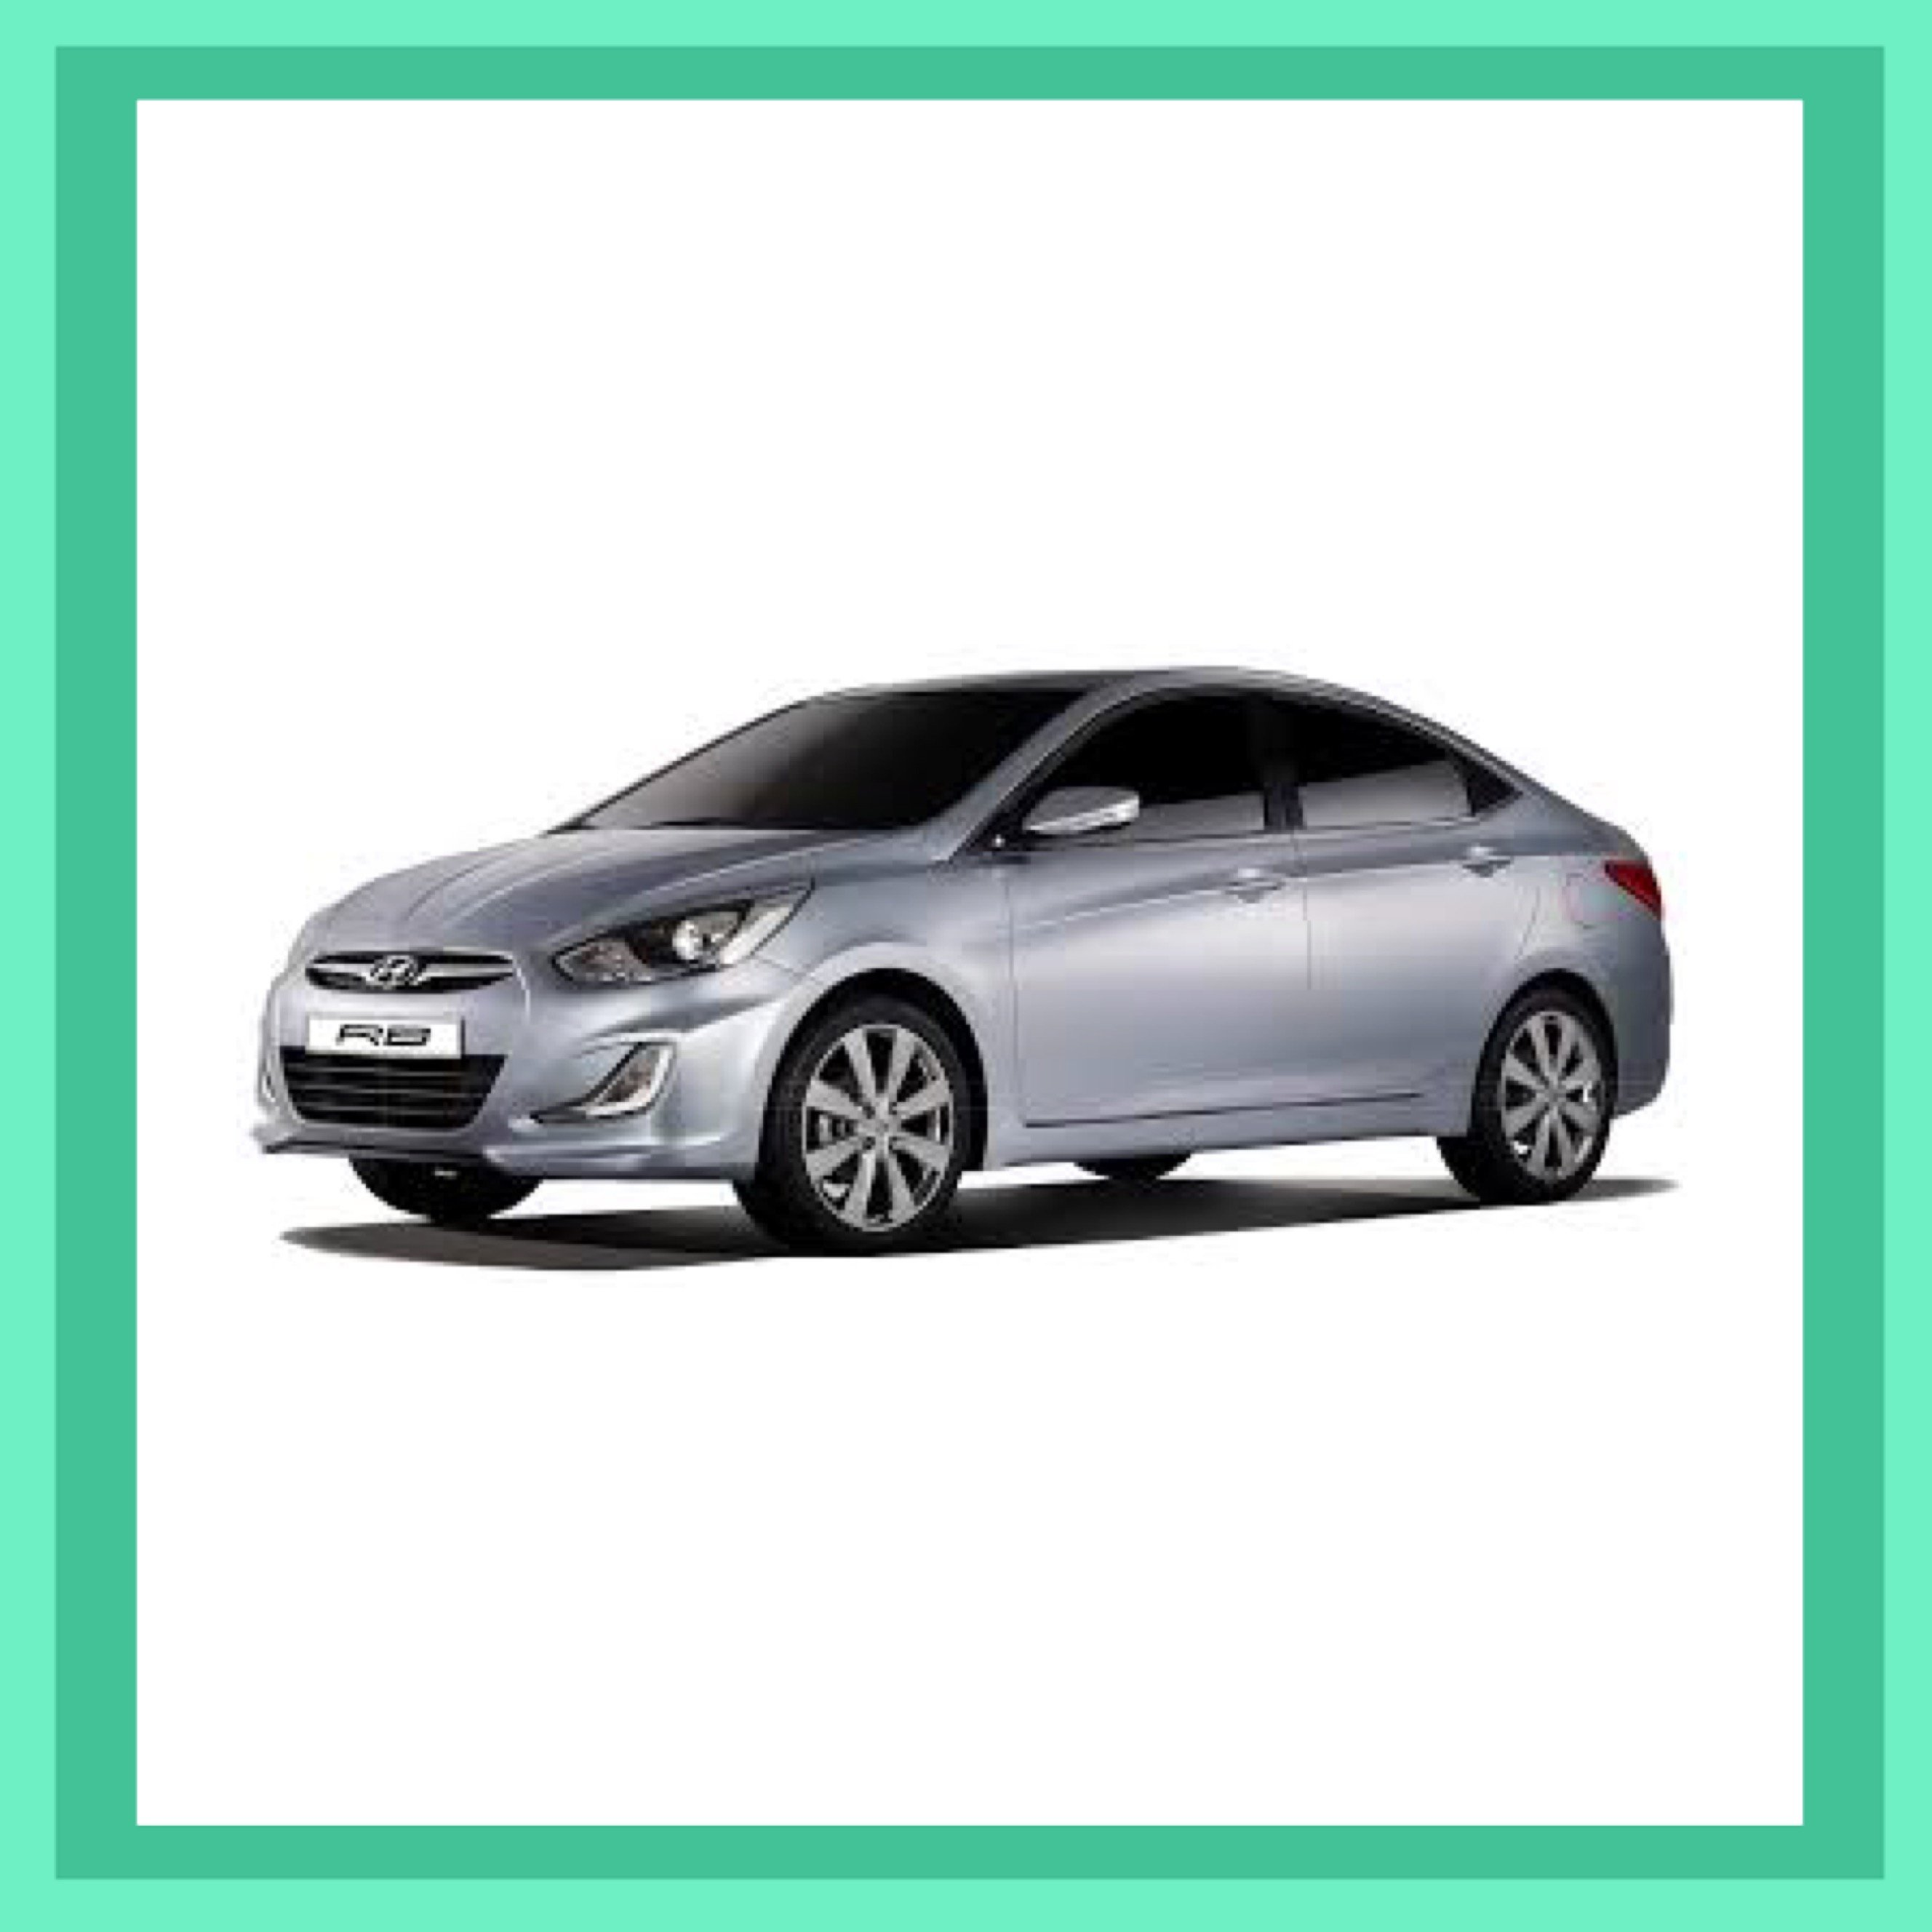 Hyundai Accent RB 2011-2013